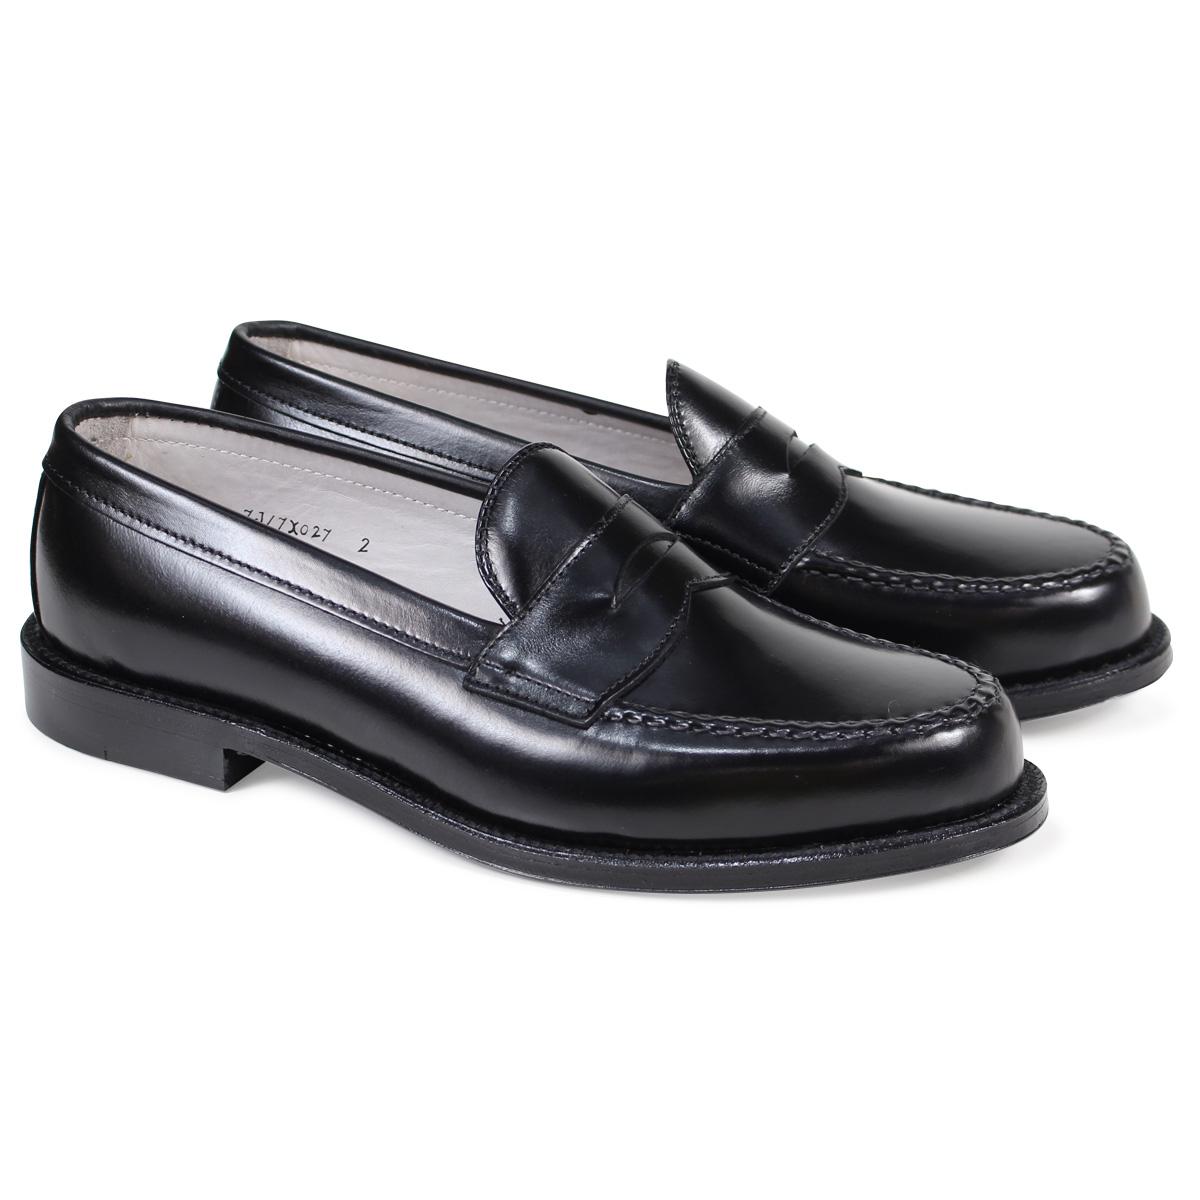 ababf7cb13e ... allsports alden alden loafers shoes leisure handsewn d wise 981 ...